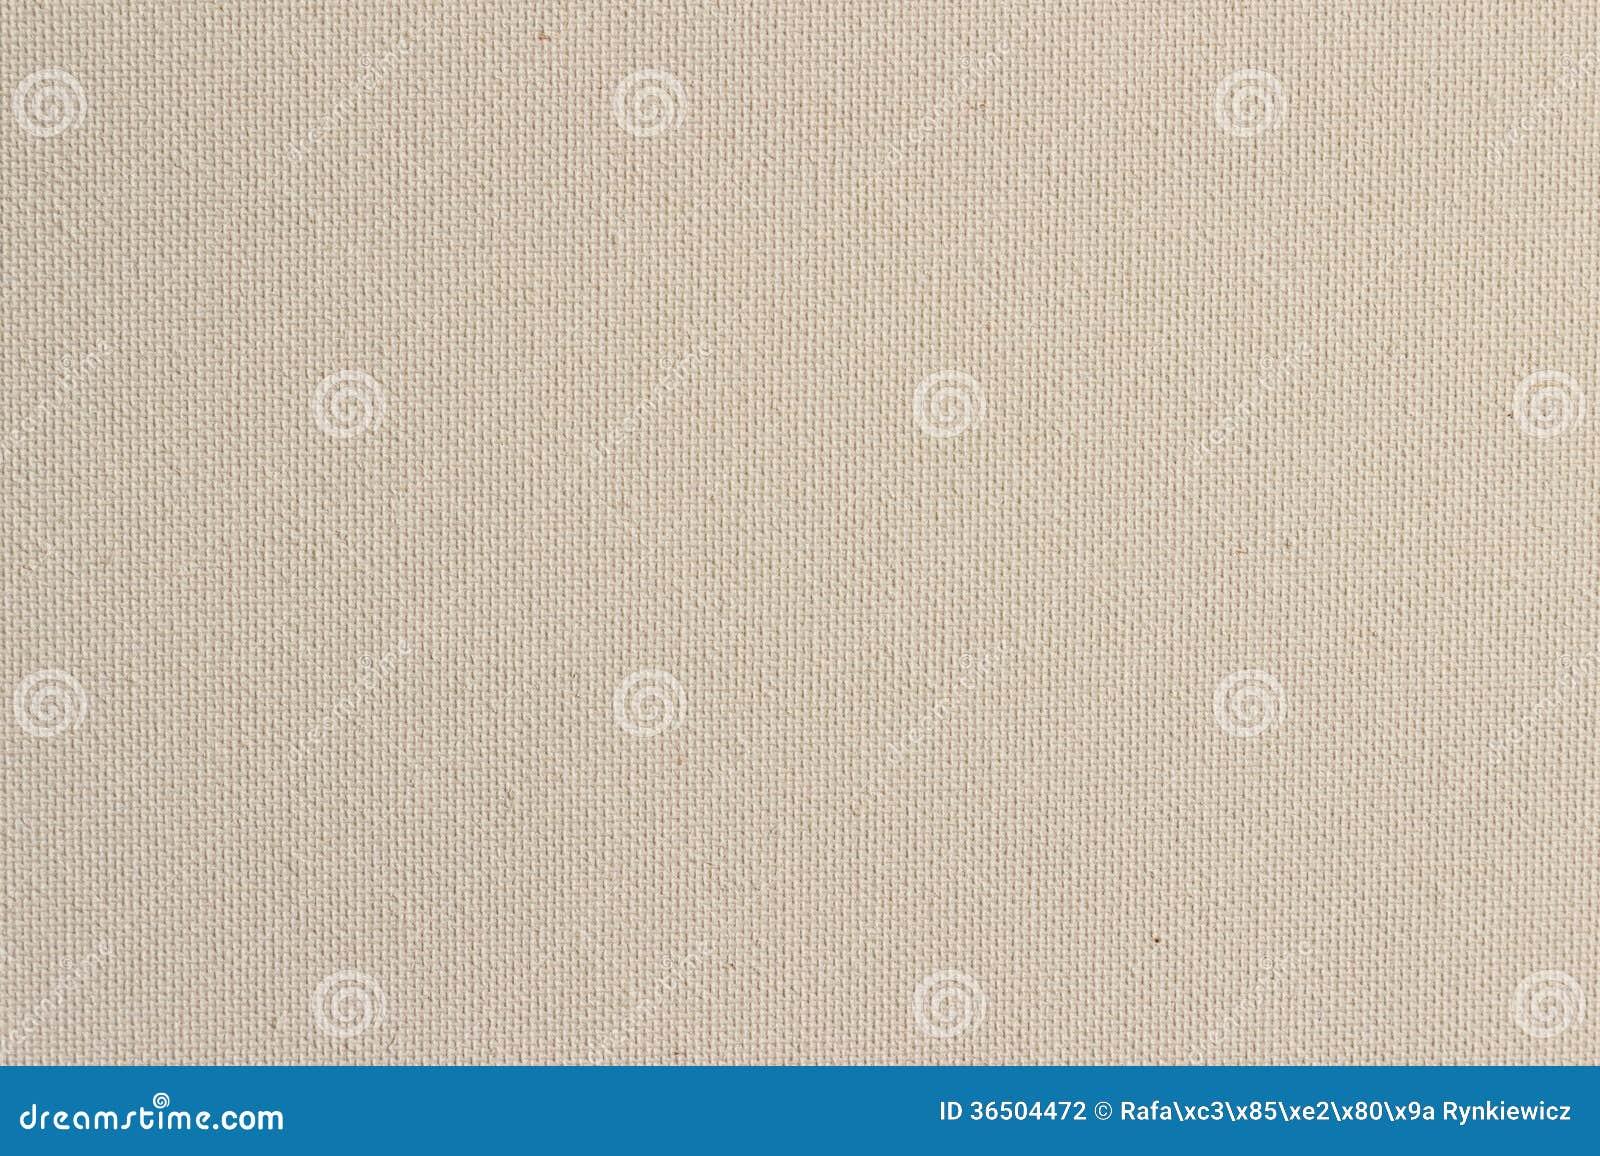 Fond de la texture brute blanche de toile